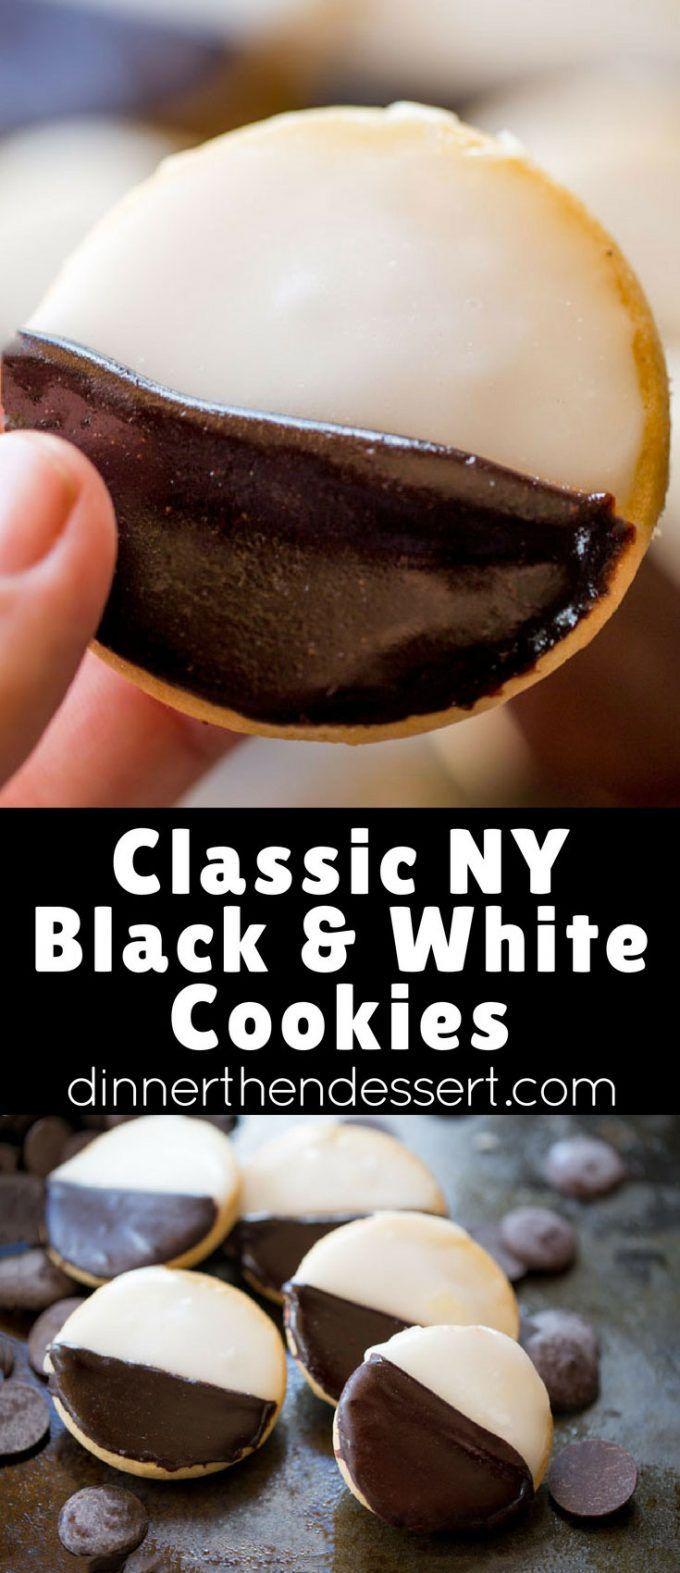 342 best Black & White Party Ideas images on Pinterest | Dessert ...